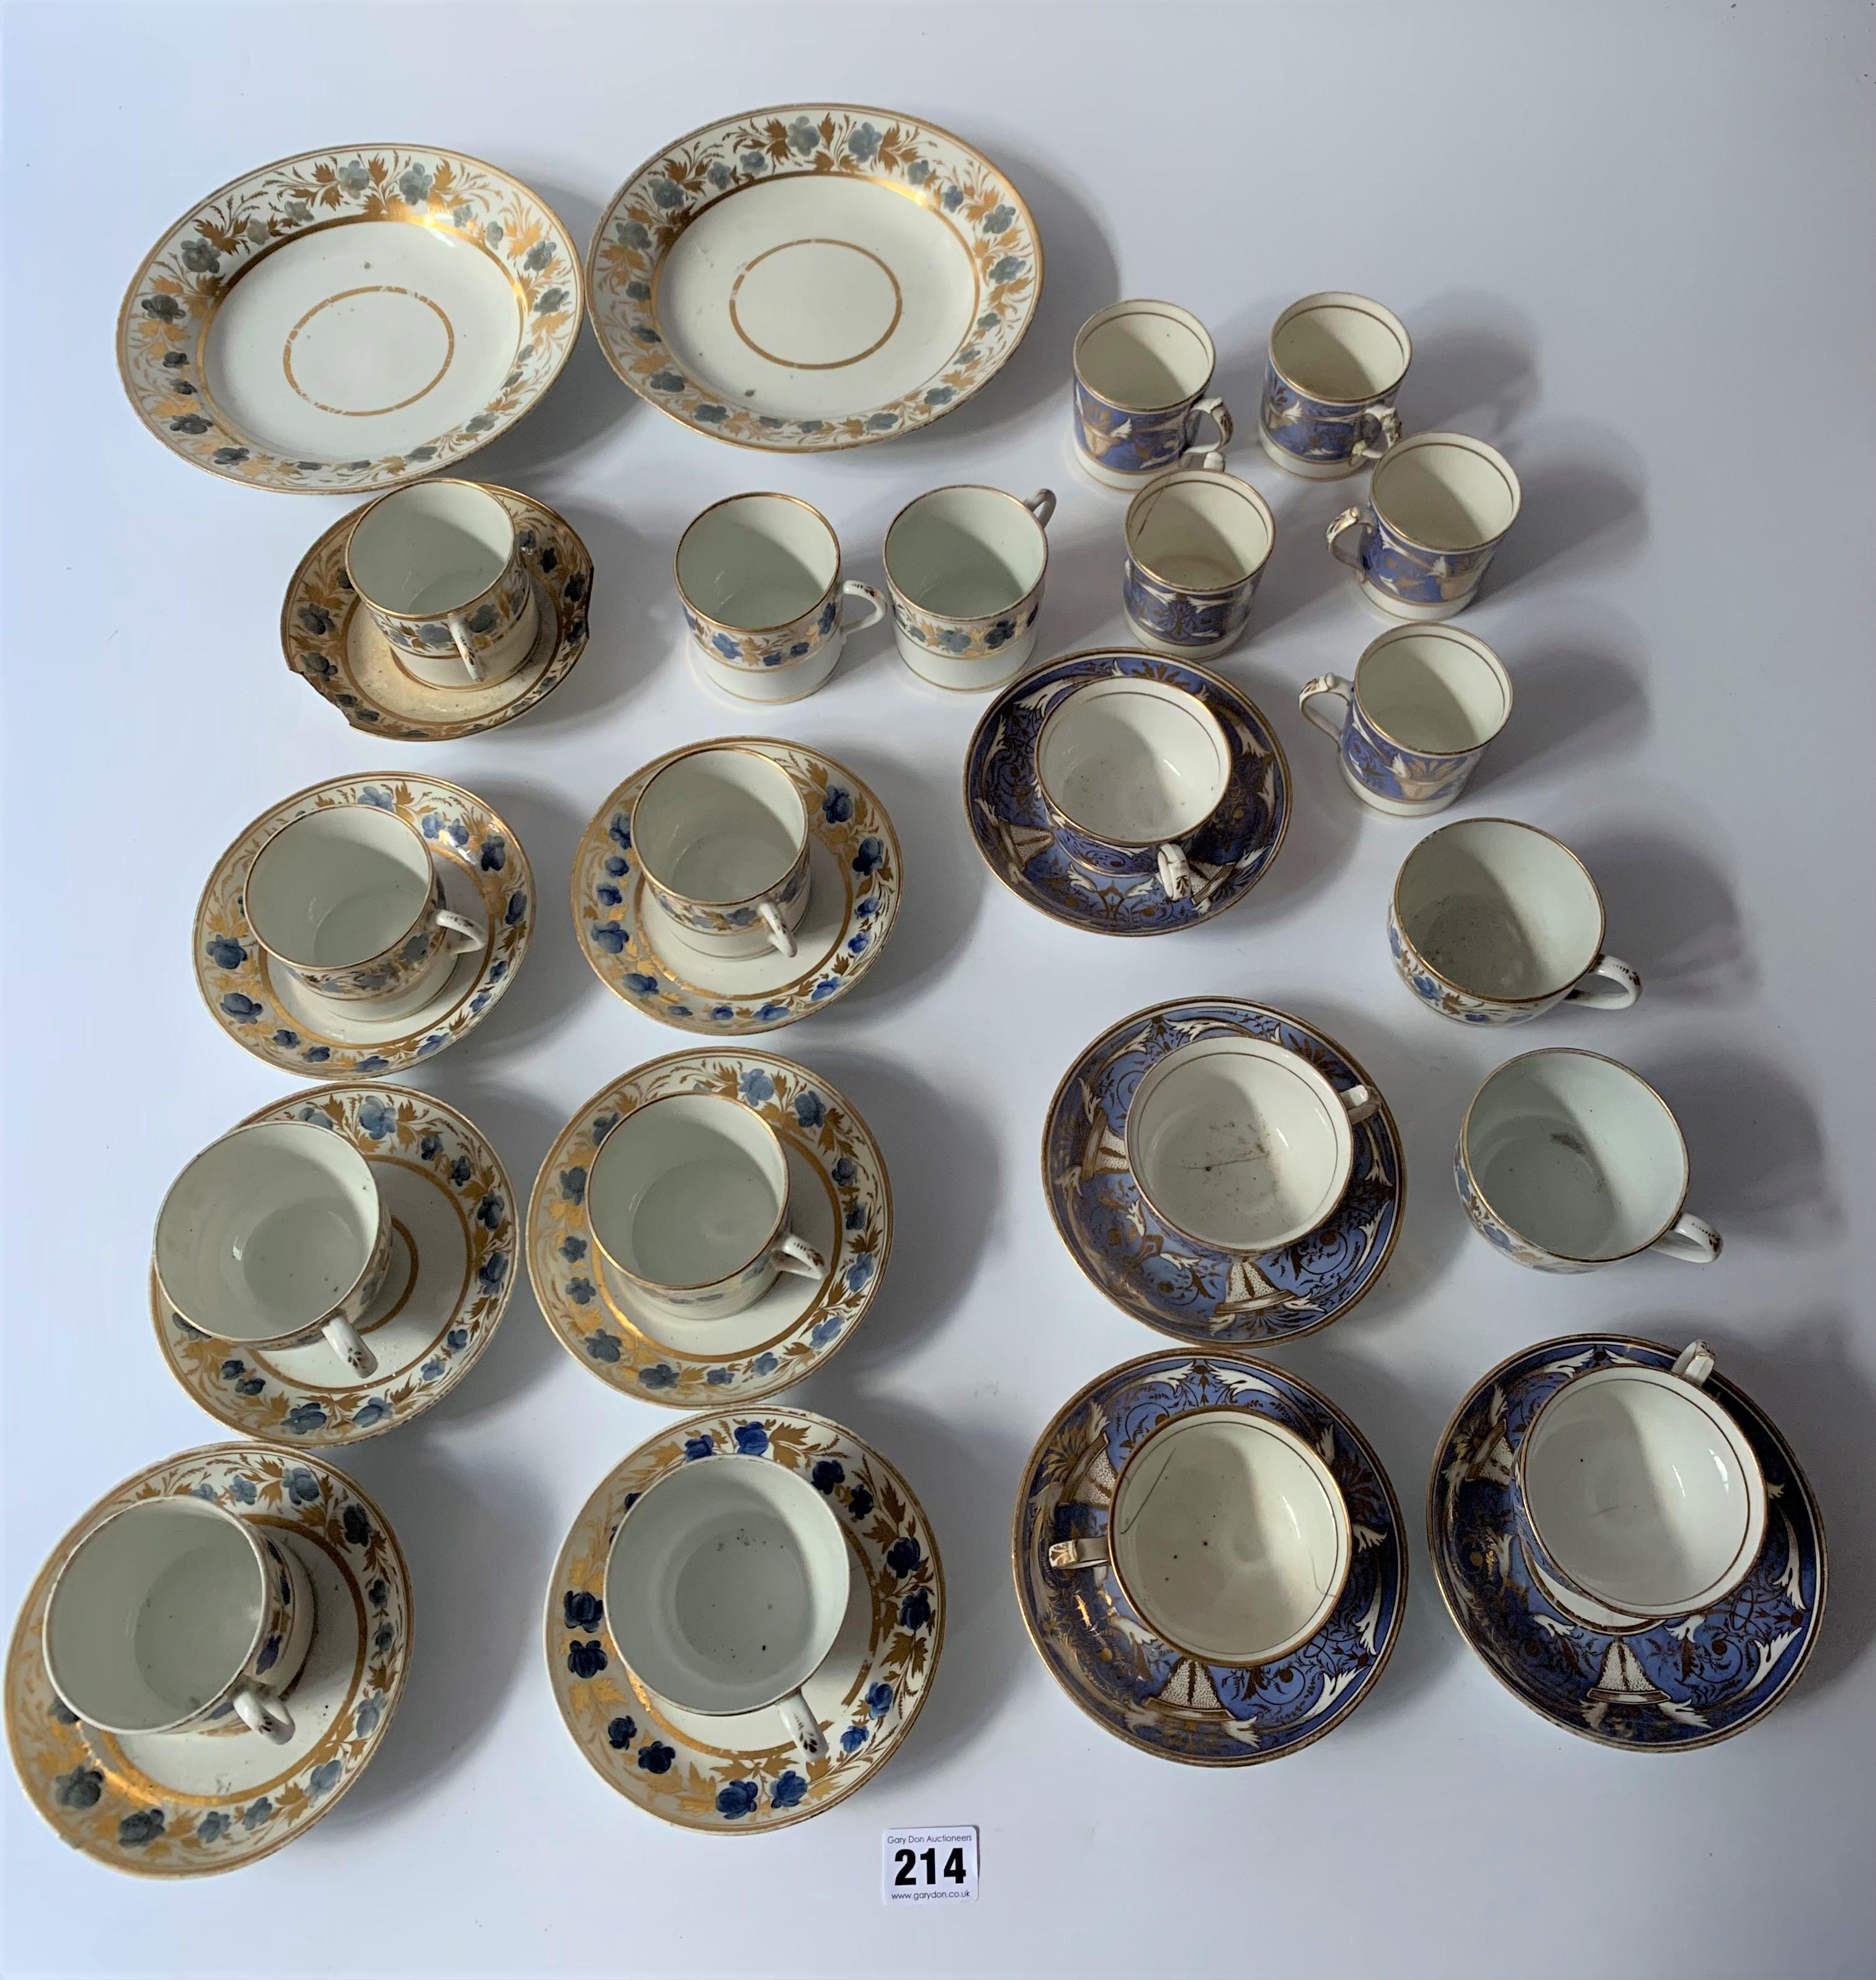 2 part blue/gilt tea and coffee sets